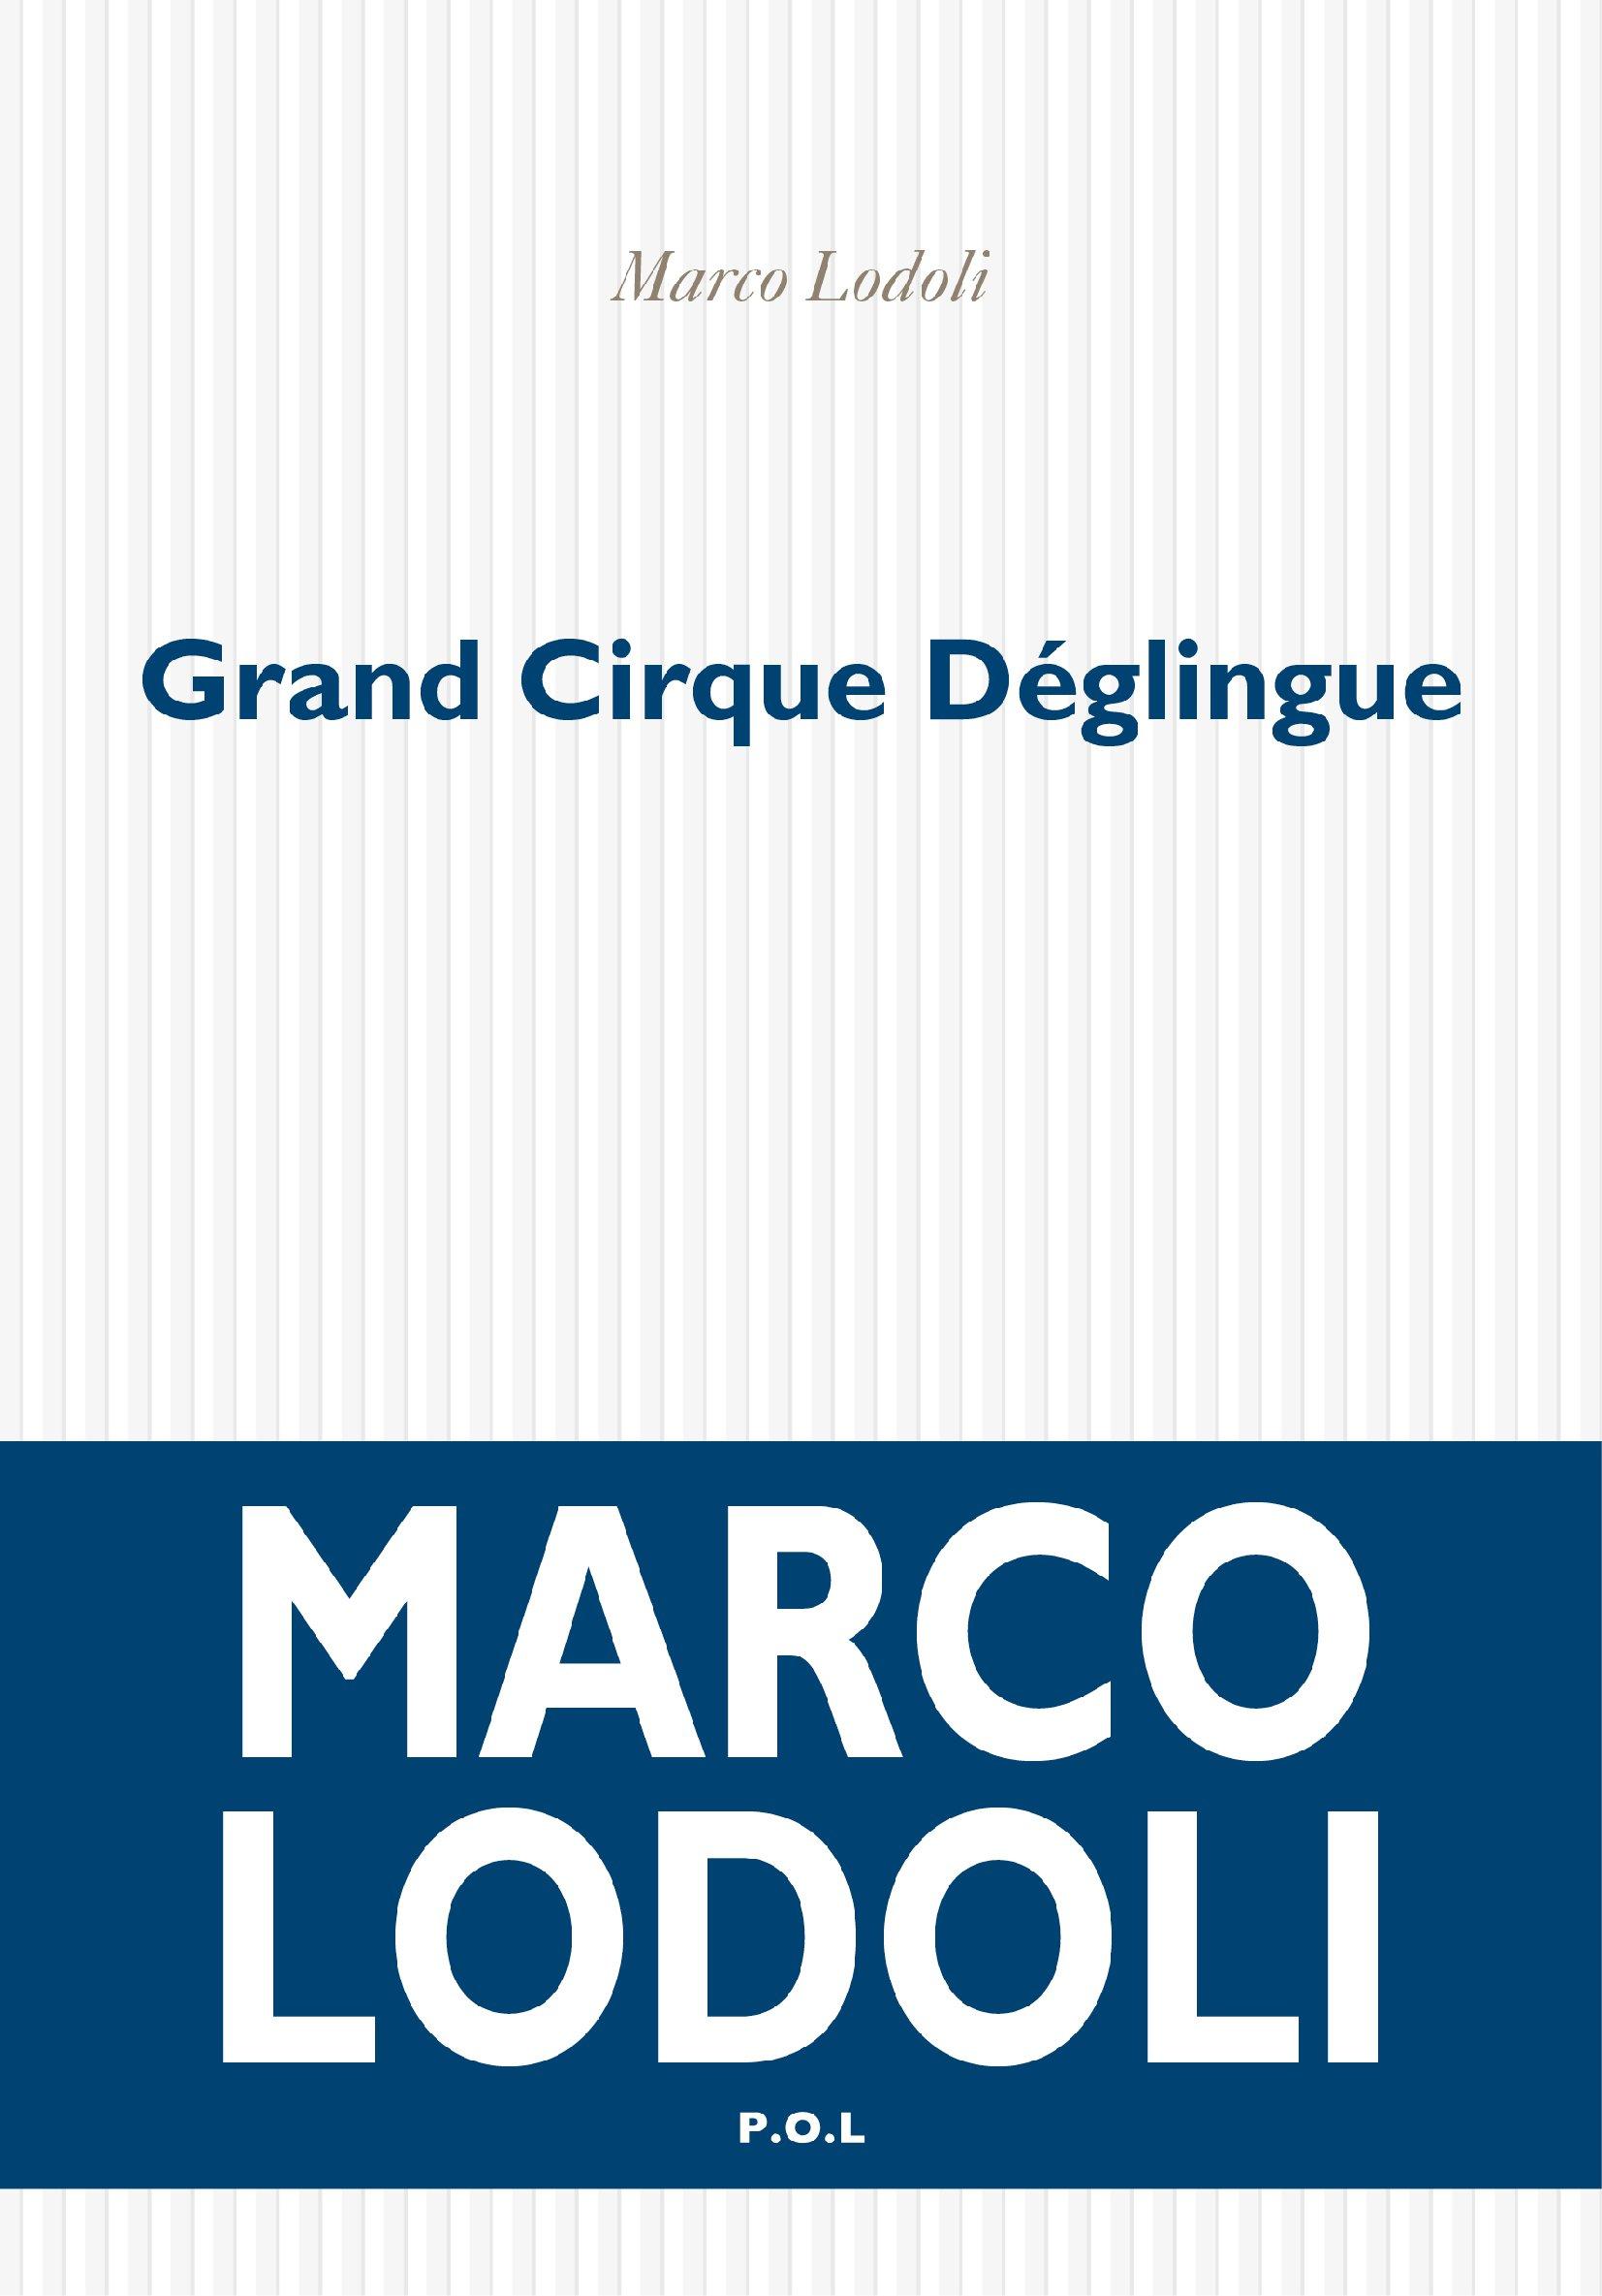 Grand Cirque Déglingue